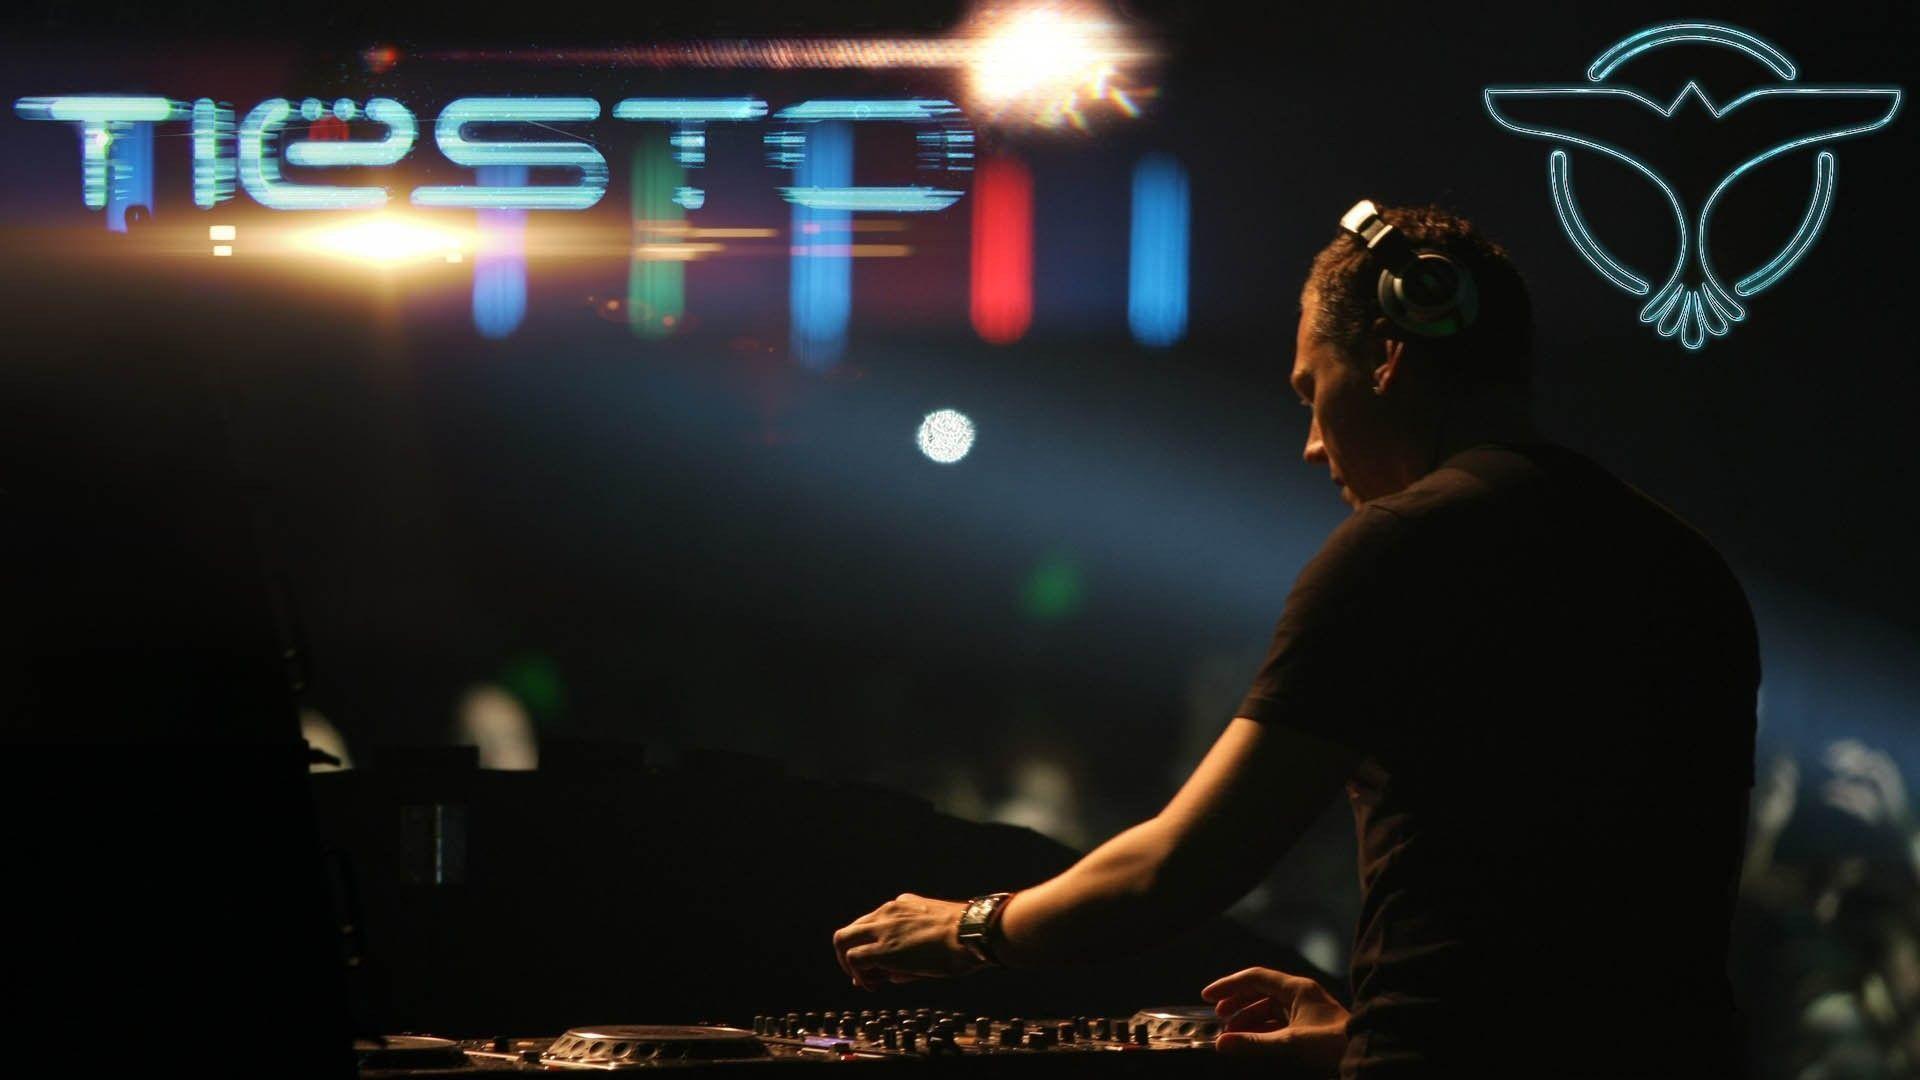 DJ Tiesto Wallpapers 2015 1920x1080